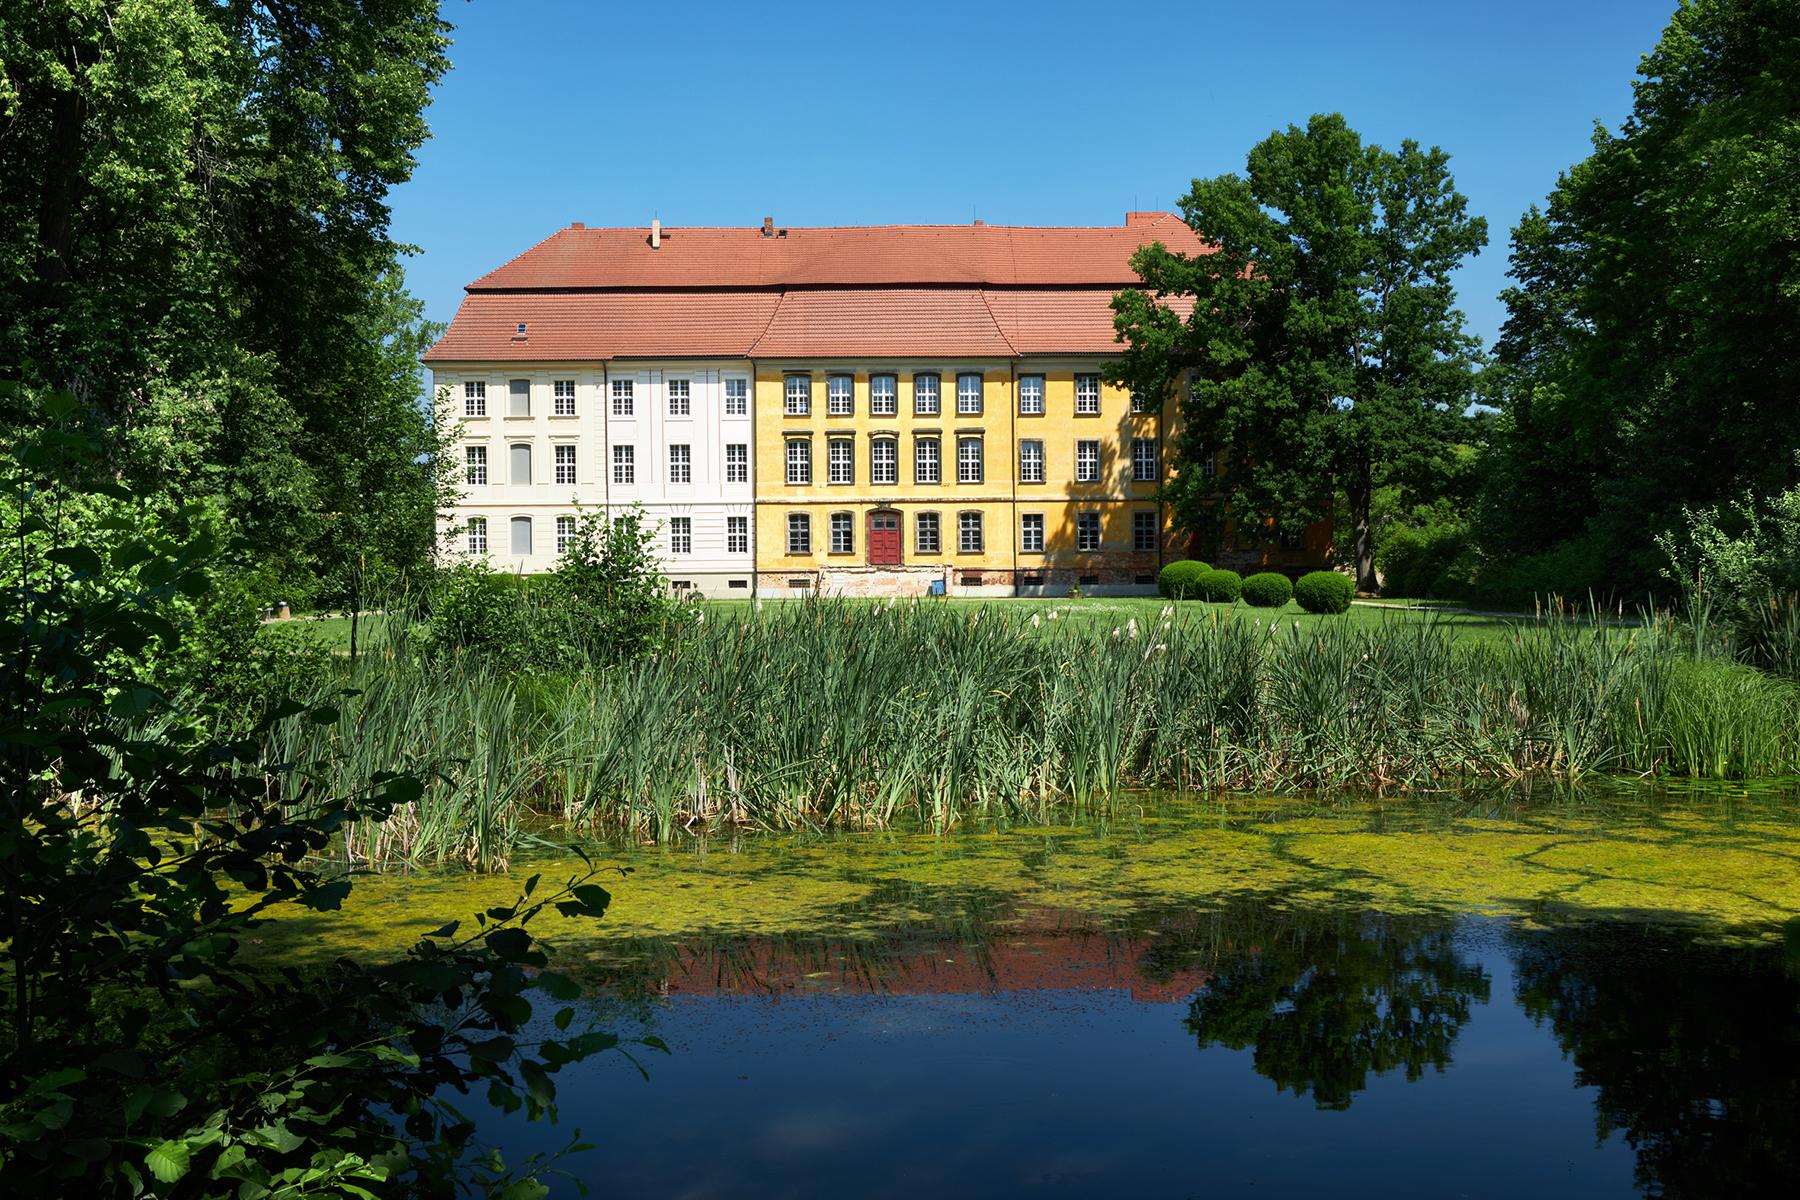 Schloss Lieberose, 2020 © Freunde des Rohkunstbau e.V. Foto: Jan Brockhaus / Freunde des Rohkunstbau e.V.